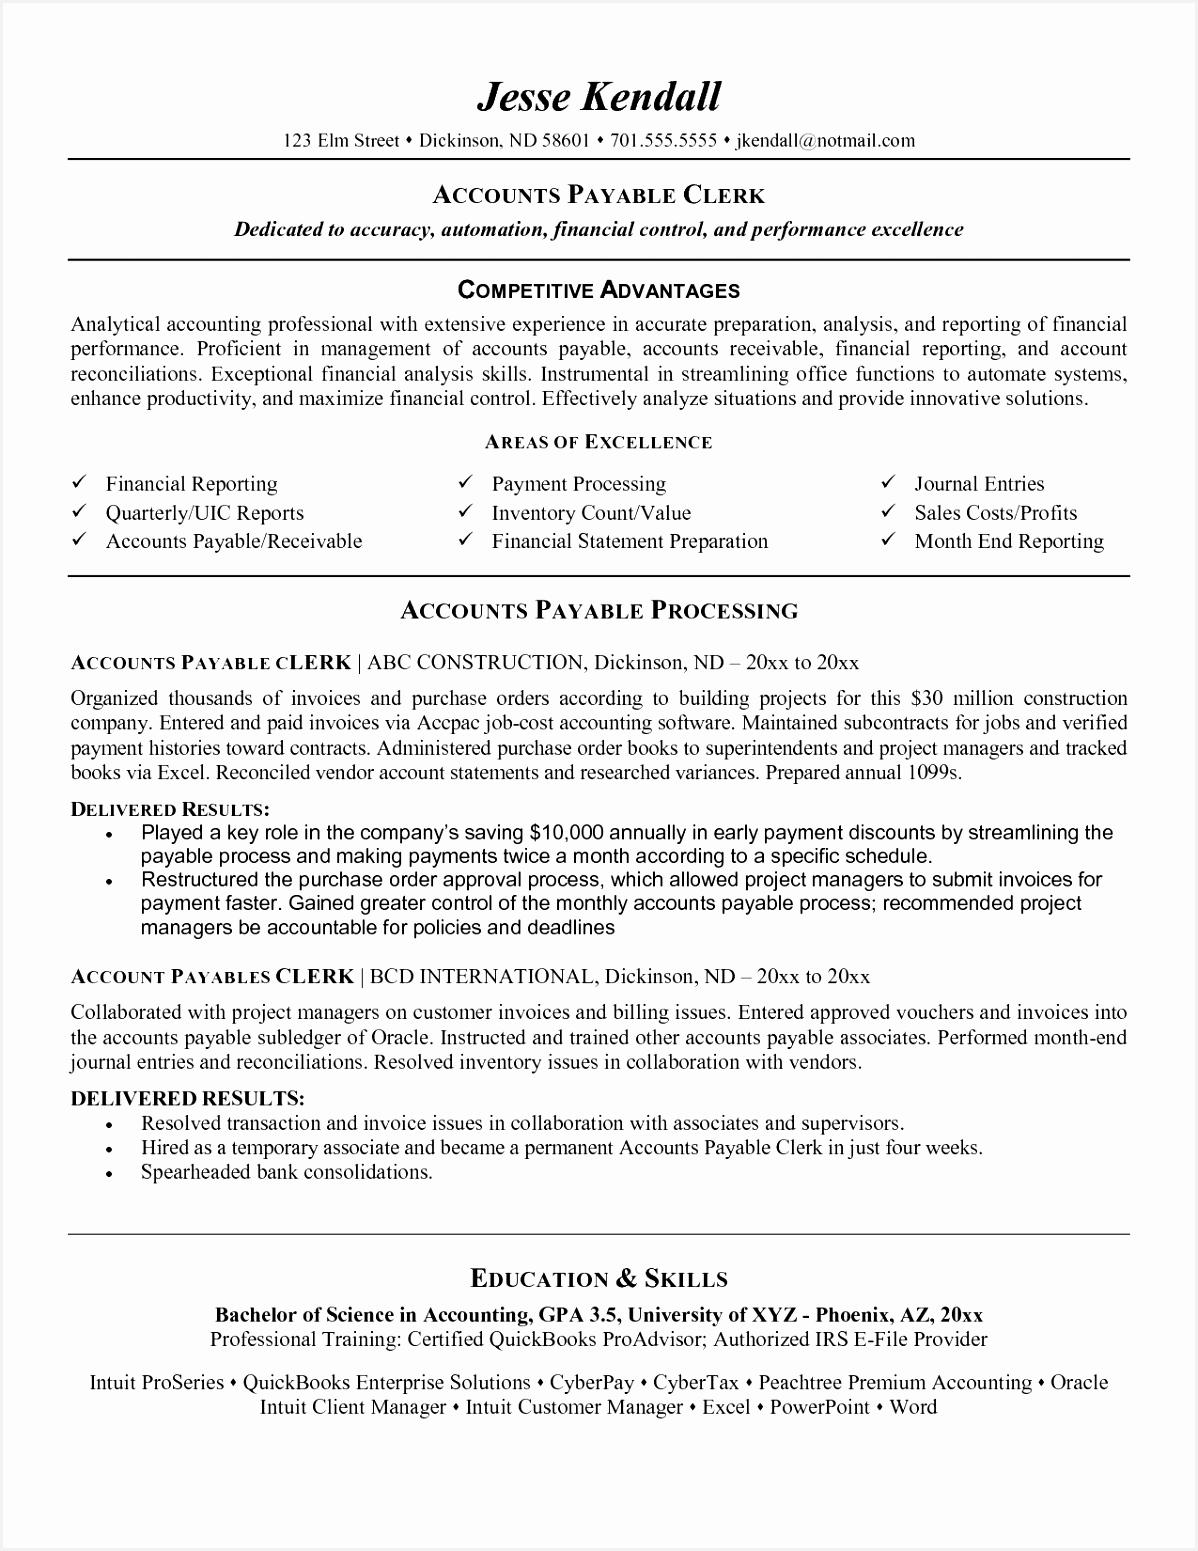 Accounts Receivable Clerk Resume Sample Free Downloads Accounts Receivable Clerk Resume Best Od Specialist Sample Resume 155111987kgn